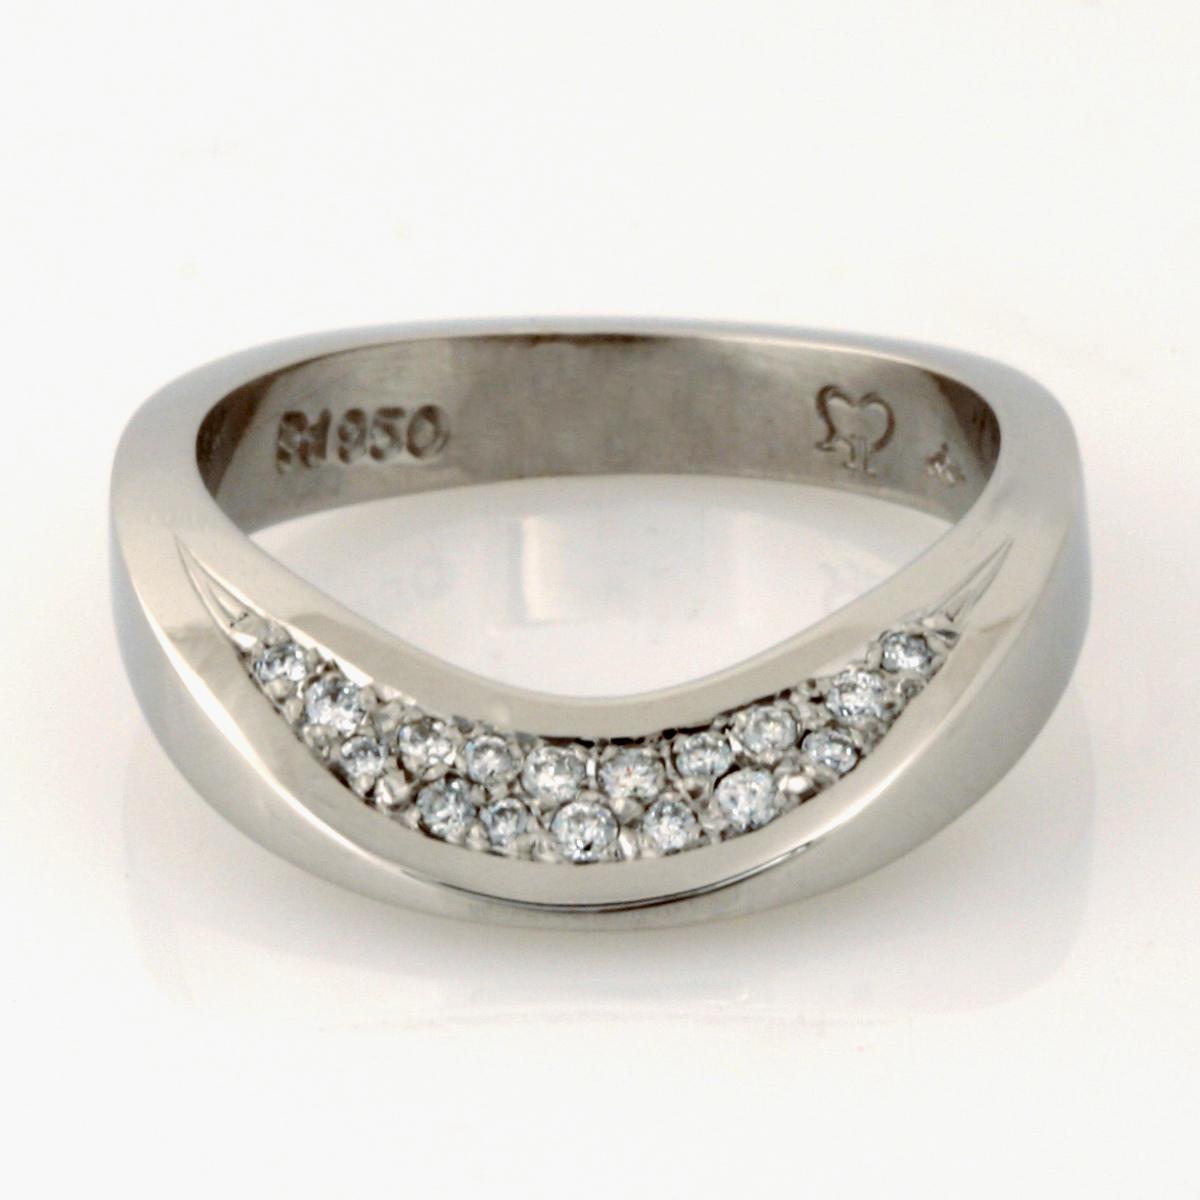 Handmade ladies palladium diamond wedding ring